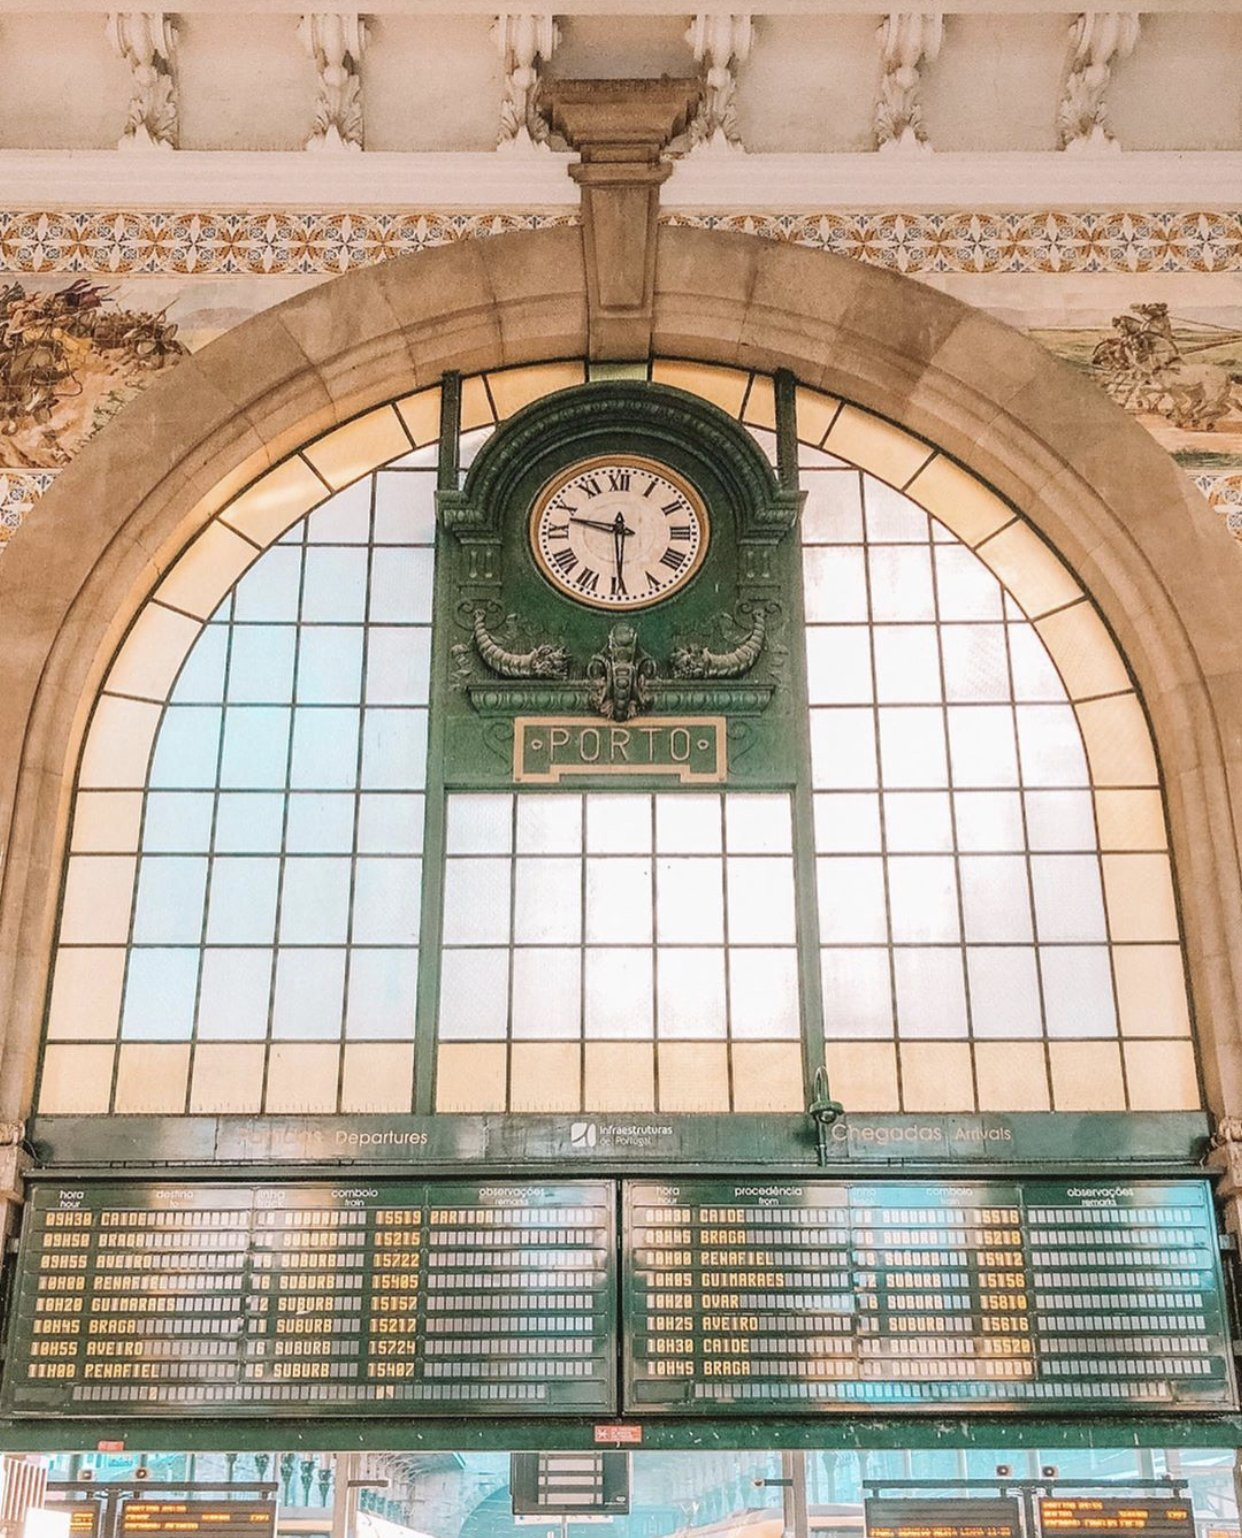 porto station clock